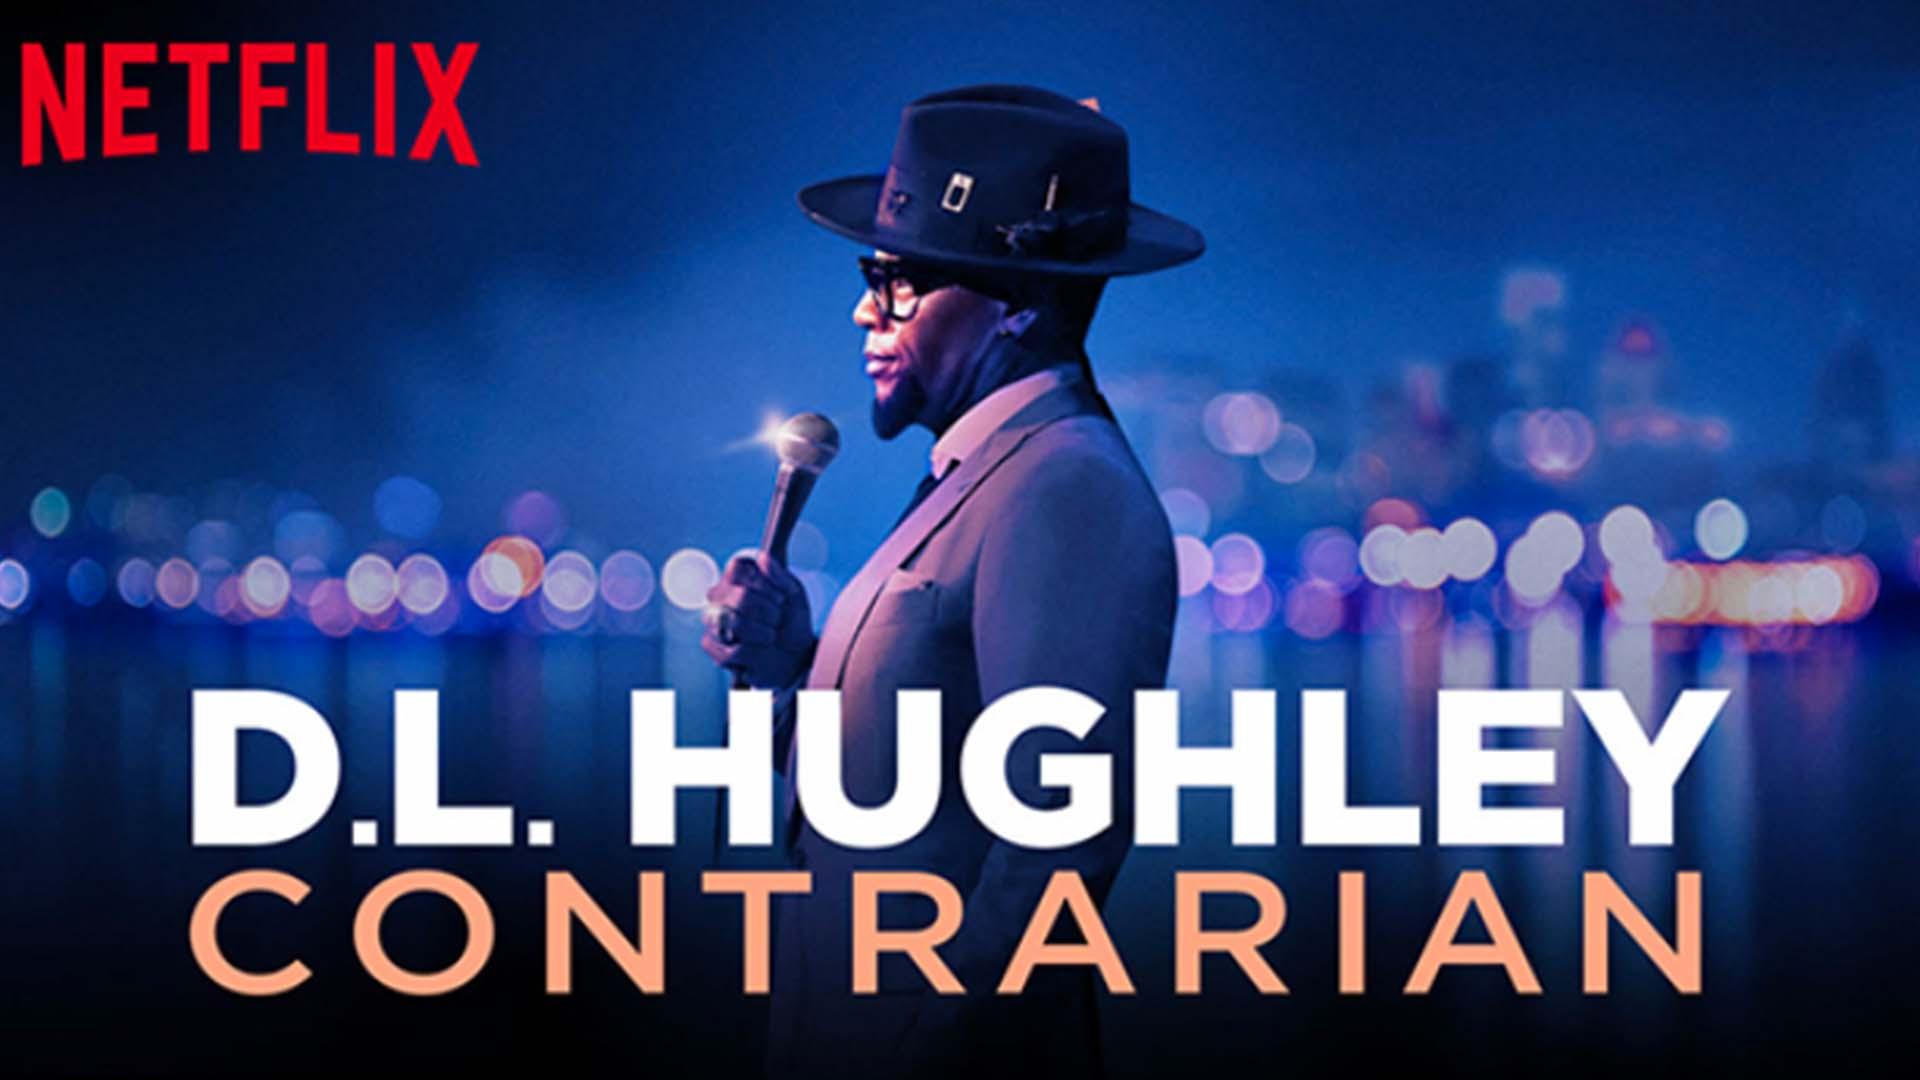 DL Hughley Contrarian Horizontal